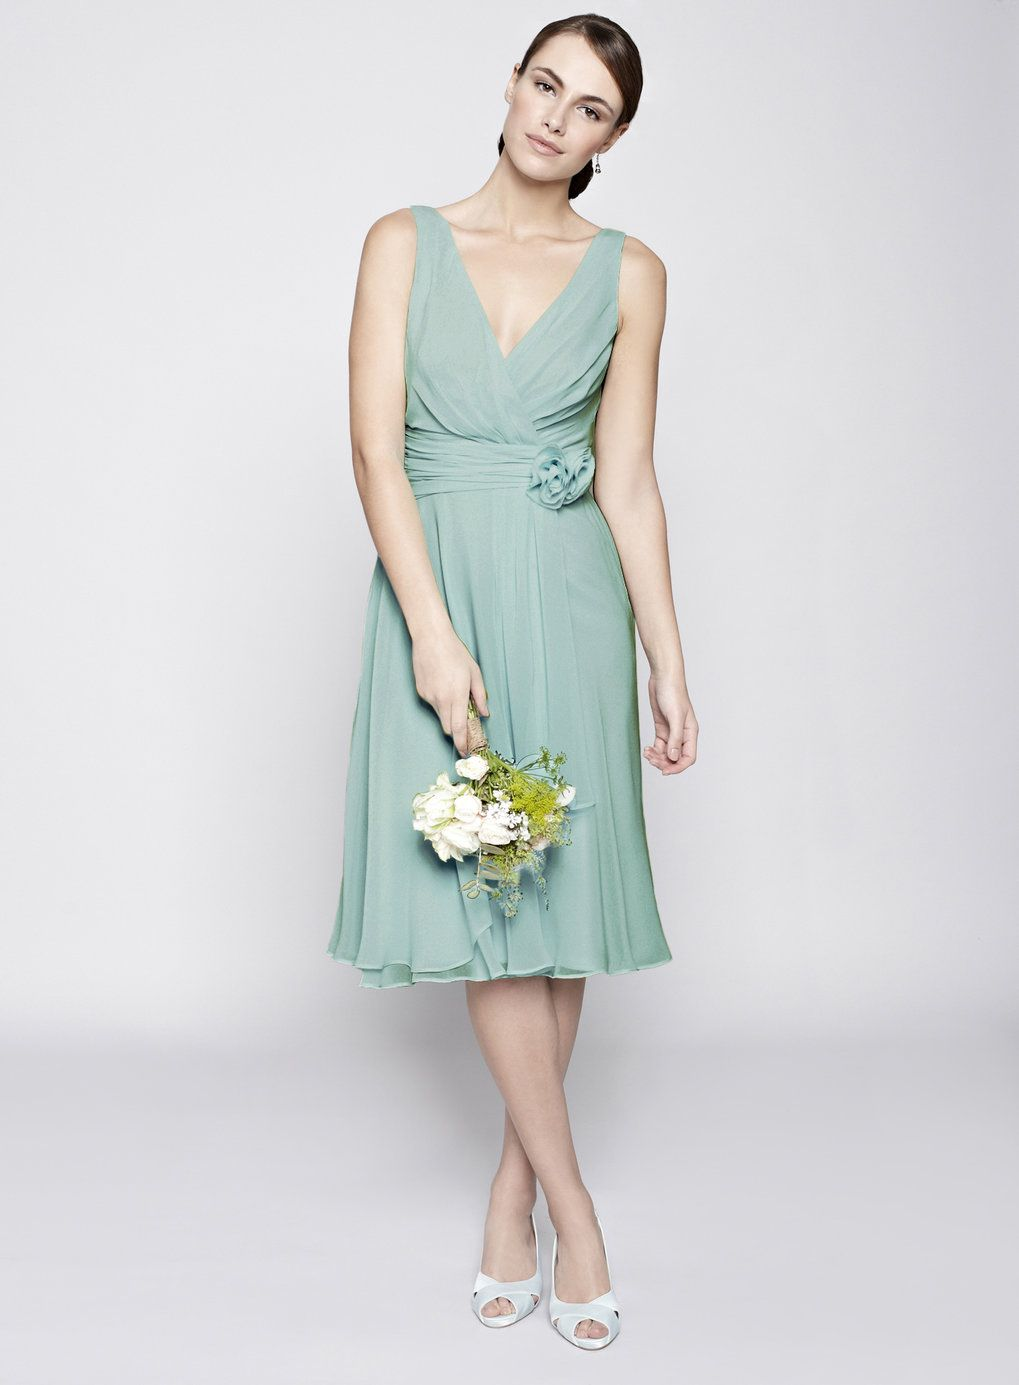 dark-mint-short-bridesmaid-dress   Mint Bridesmaid Dress   Pinterest ...